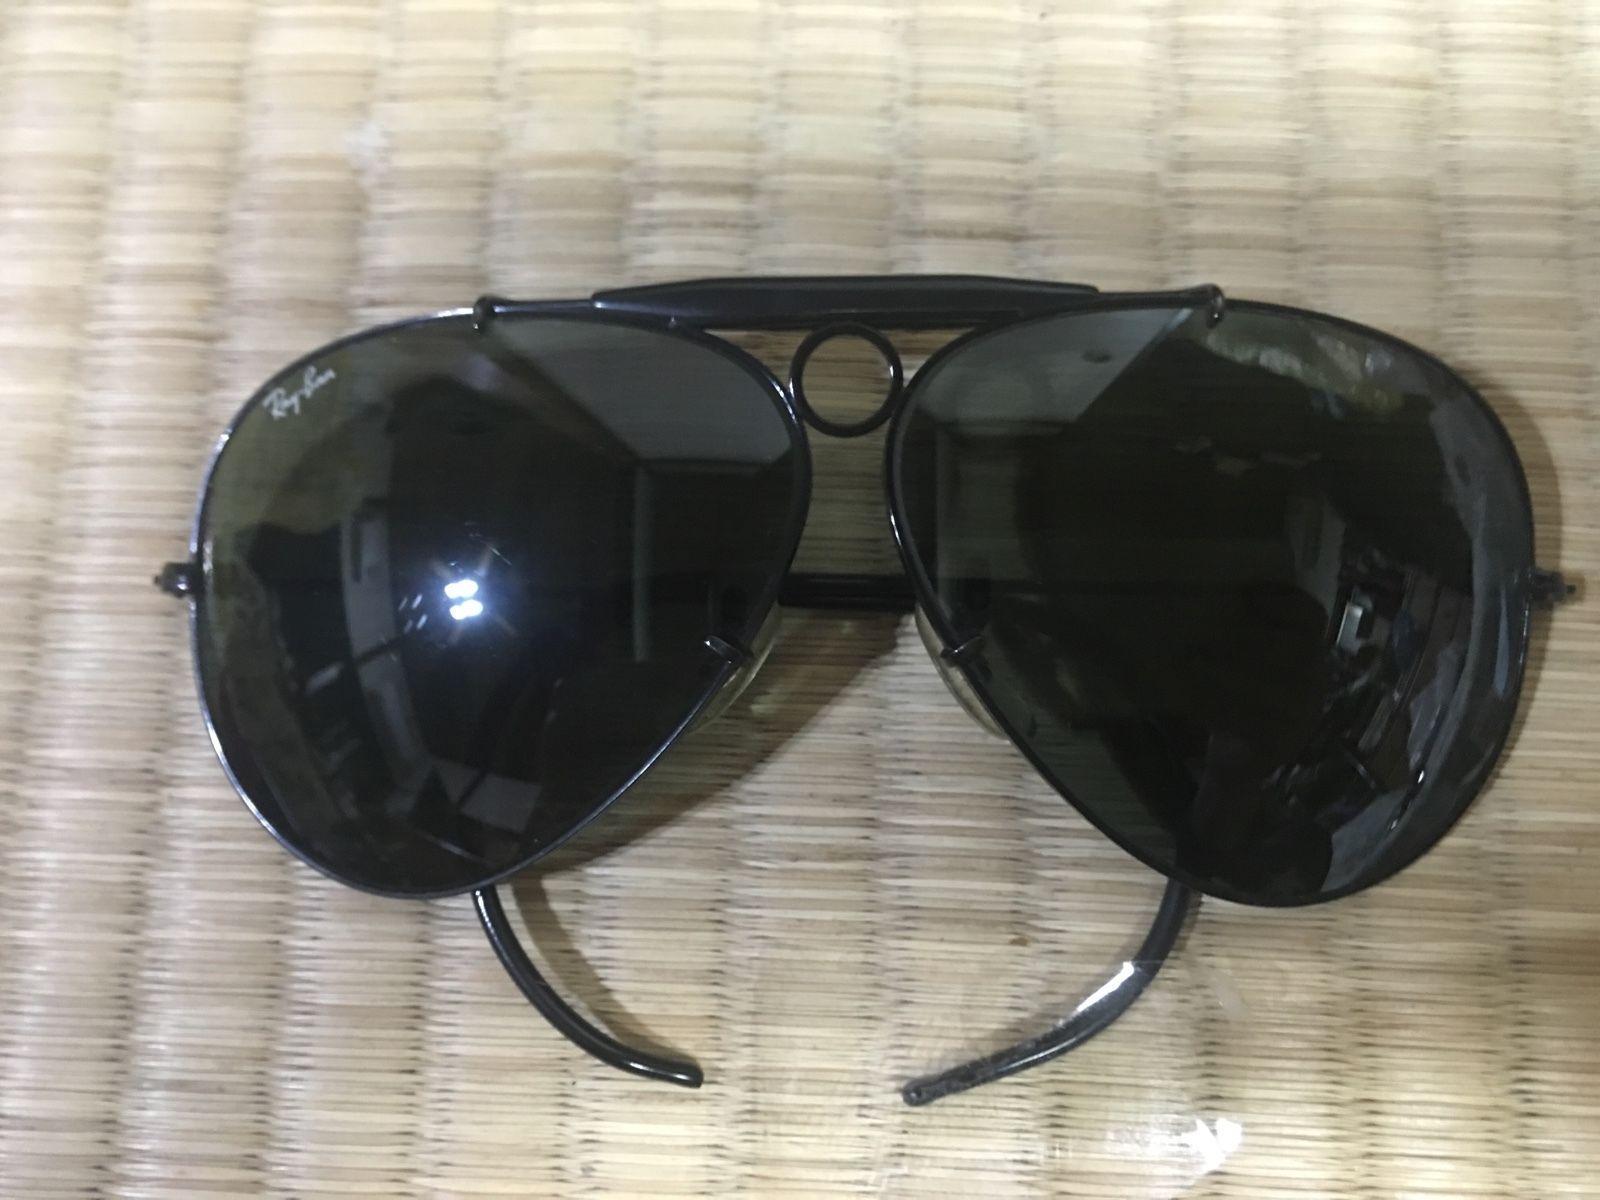 d5c9c24eb8e Vintage B L Ray Ban USA Aviator Sunglasses Black G-15 Lens Shooter ...